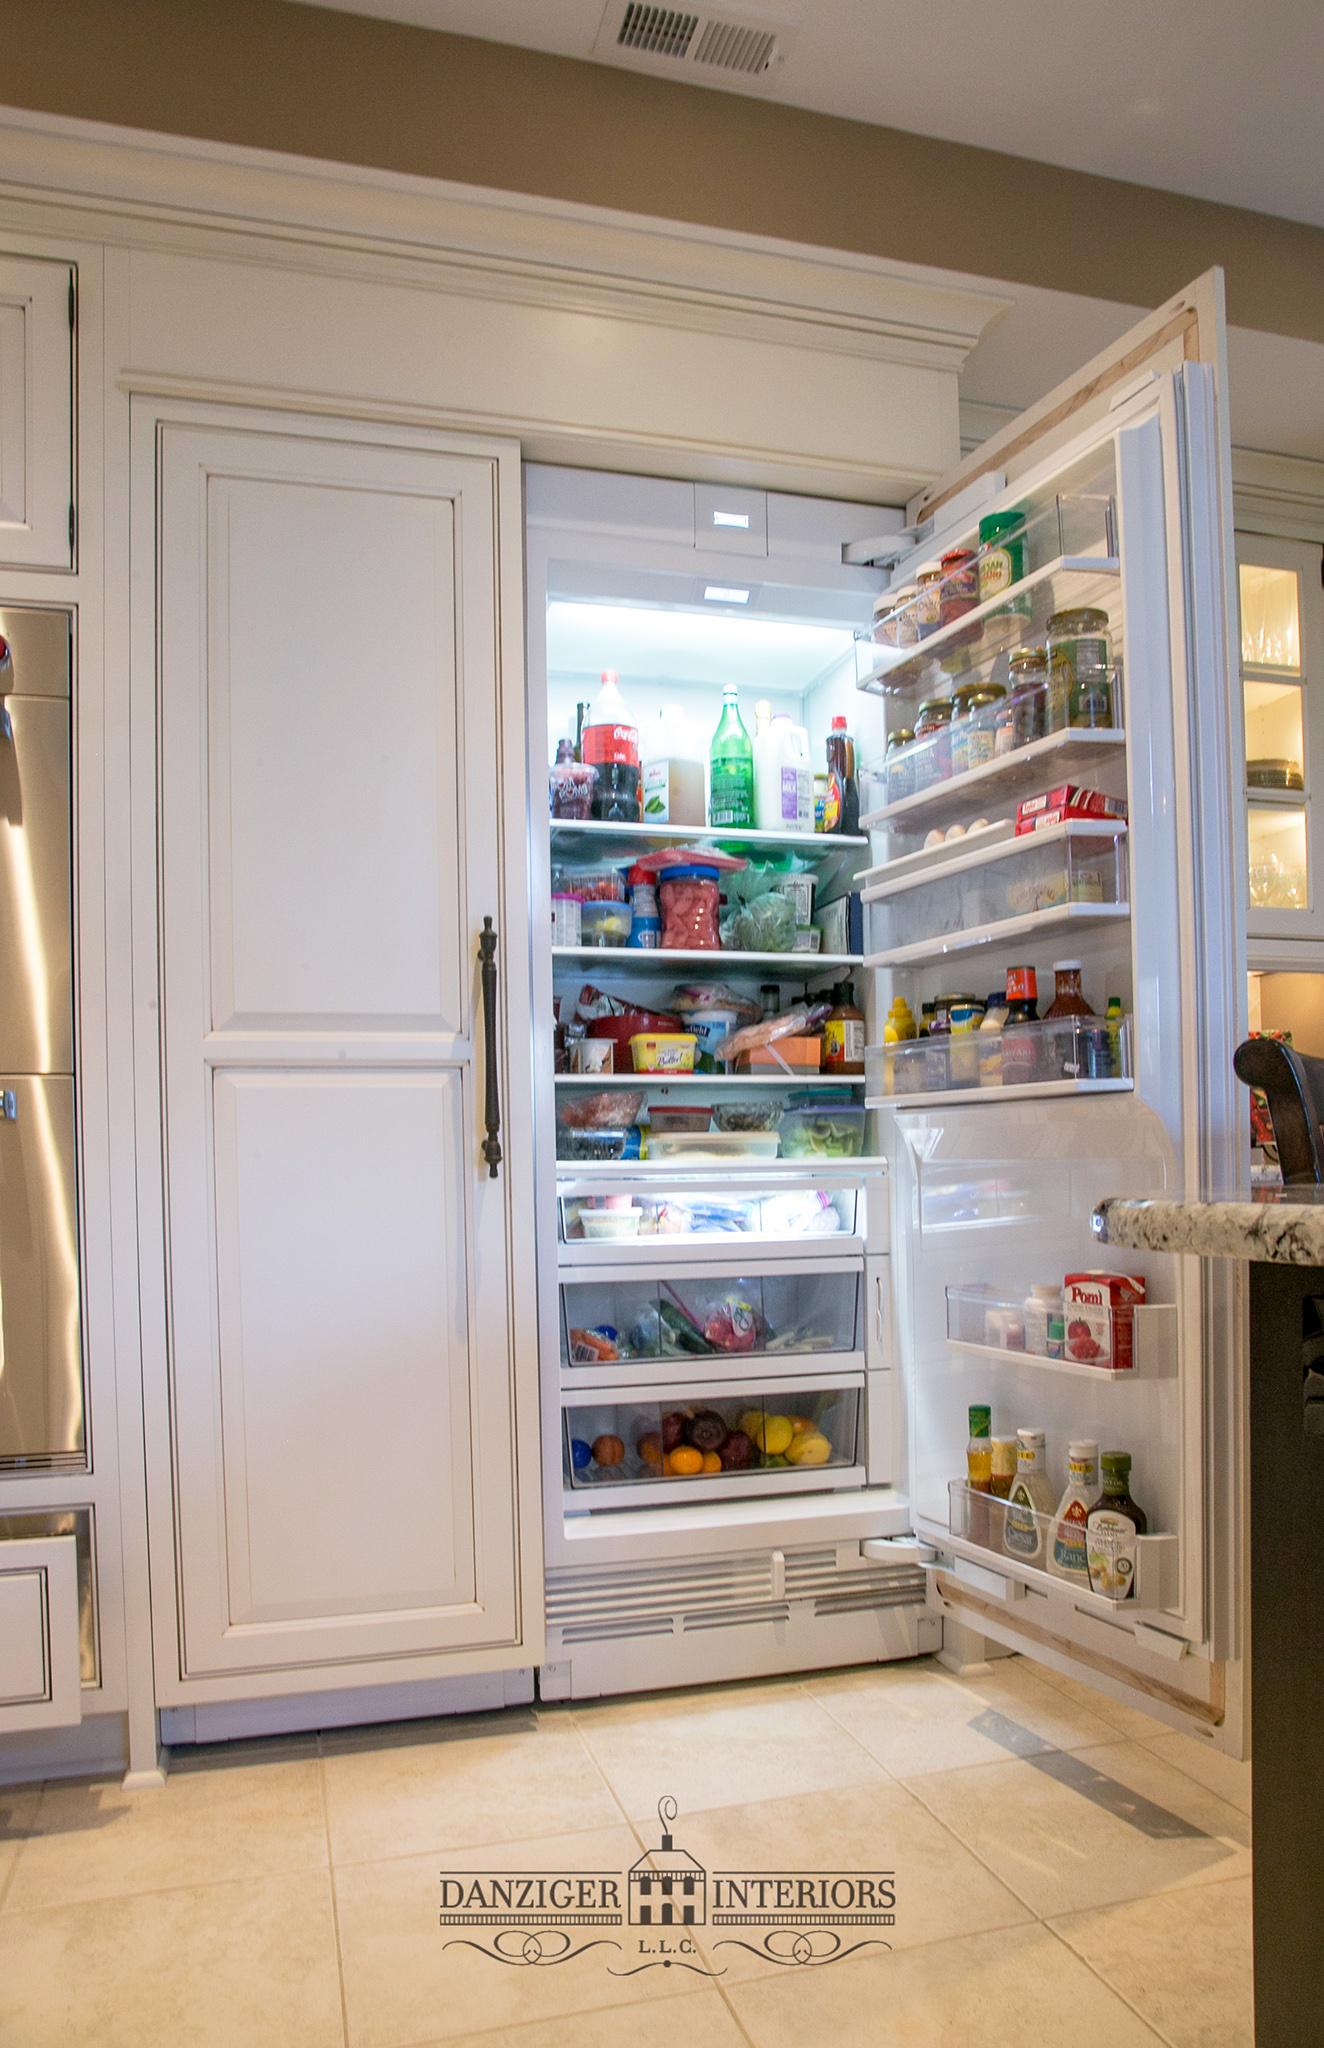 Open Refrigerator / Freezer left side